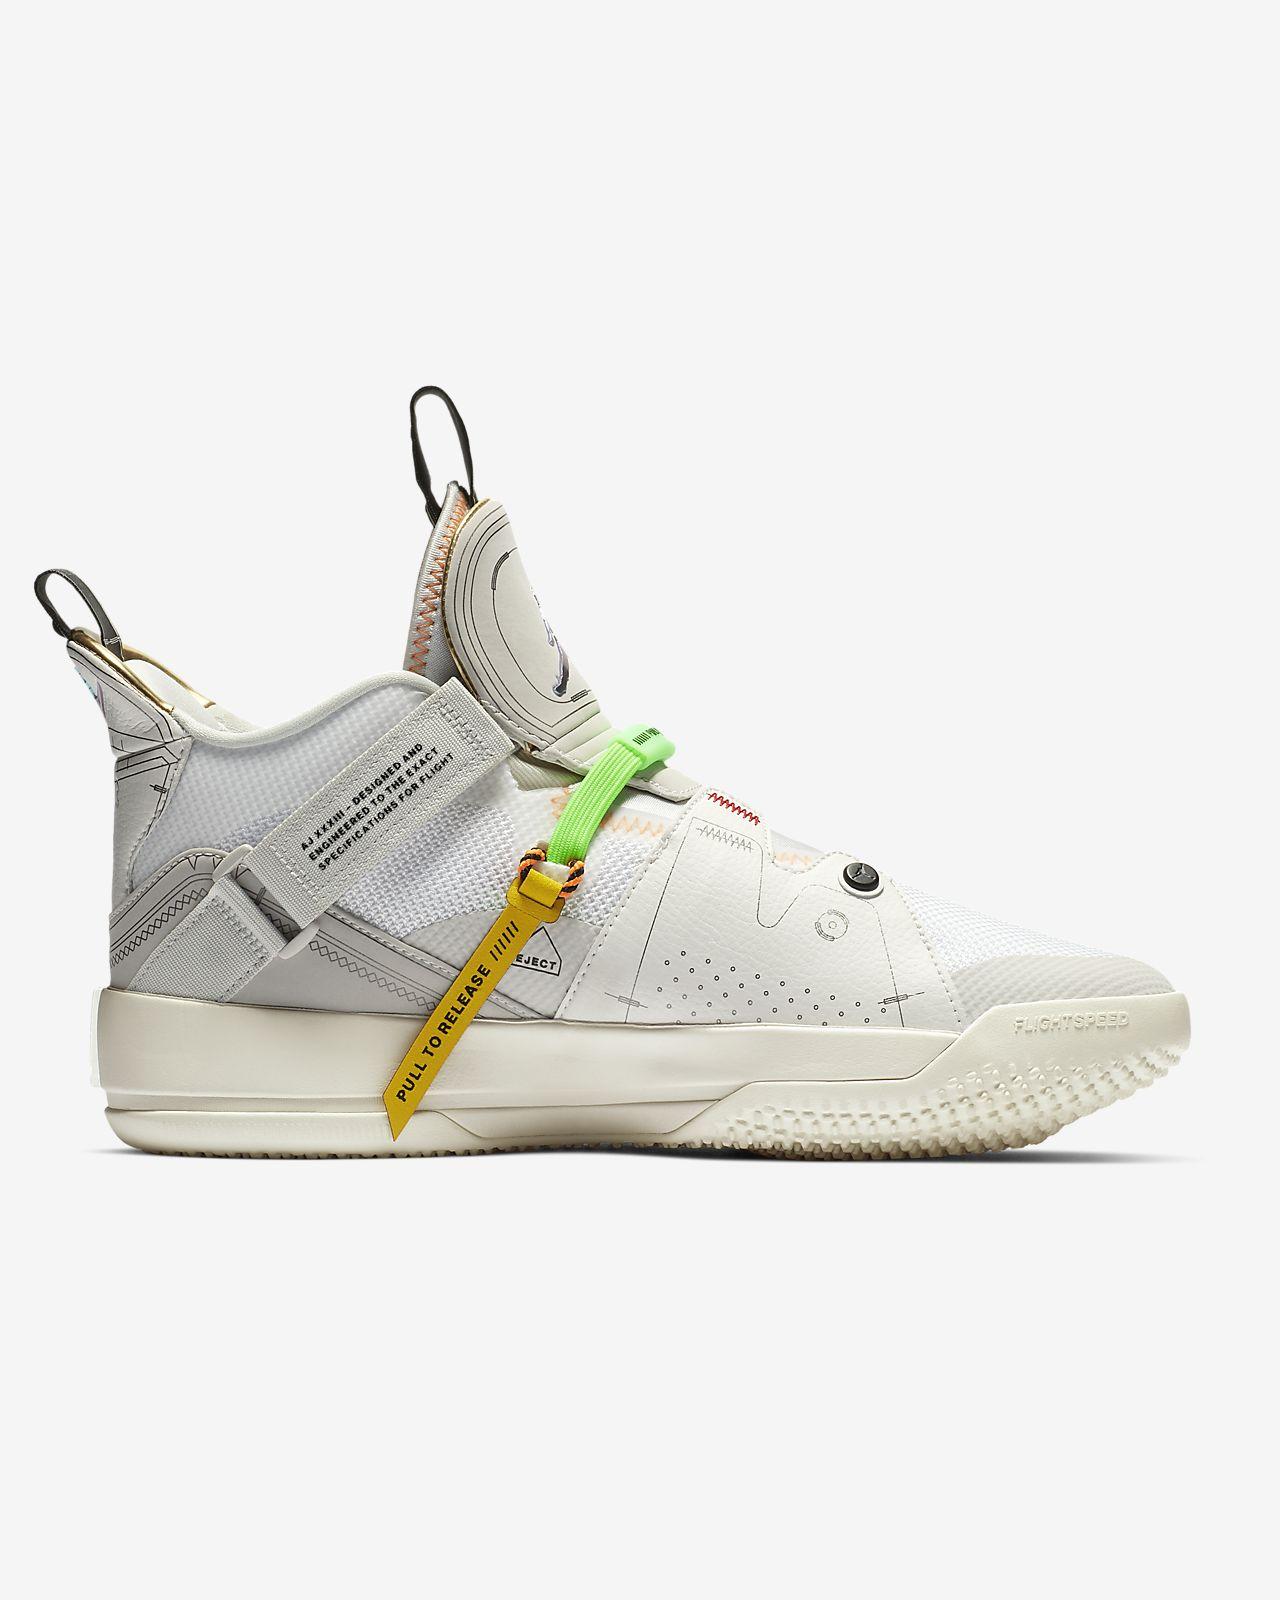 5fcbb73907e8 Low Resolution Air Jordan XXXIII Basketball Shoe Air Jordan XXXIII Basketball  Shoe